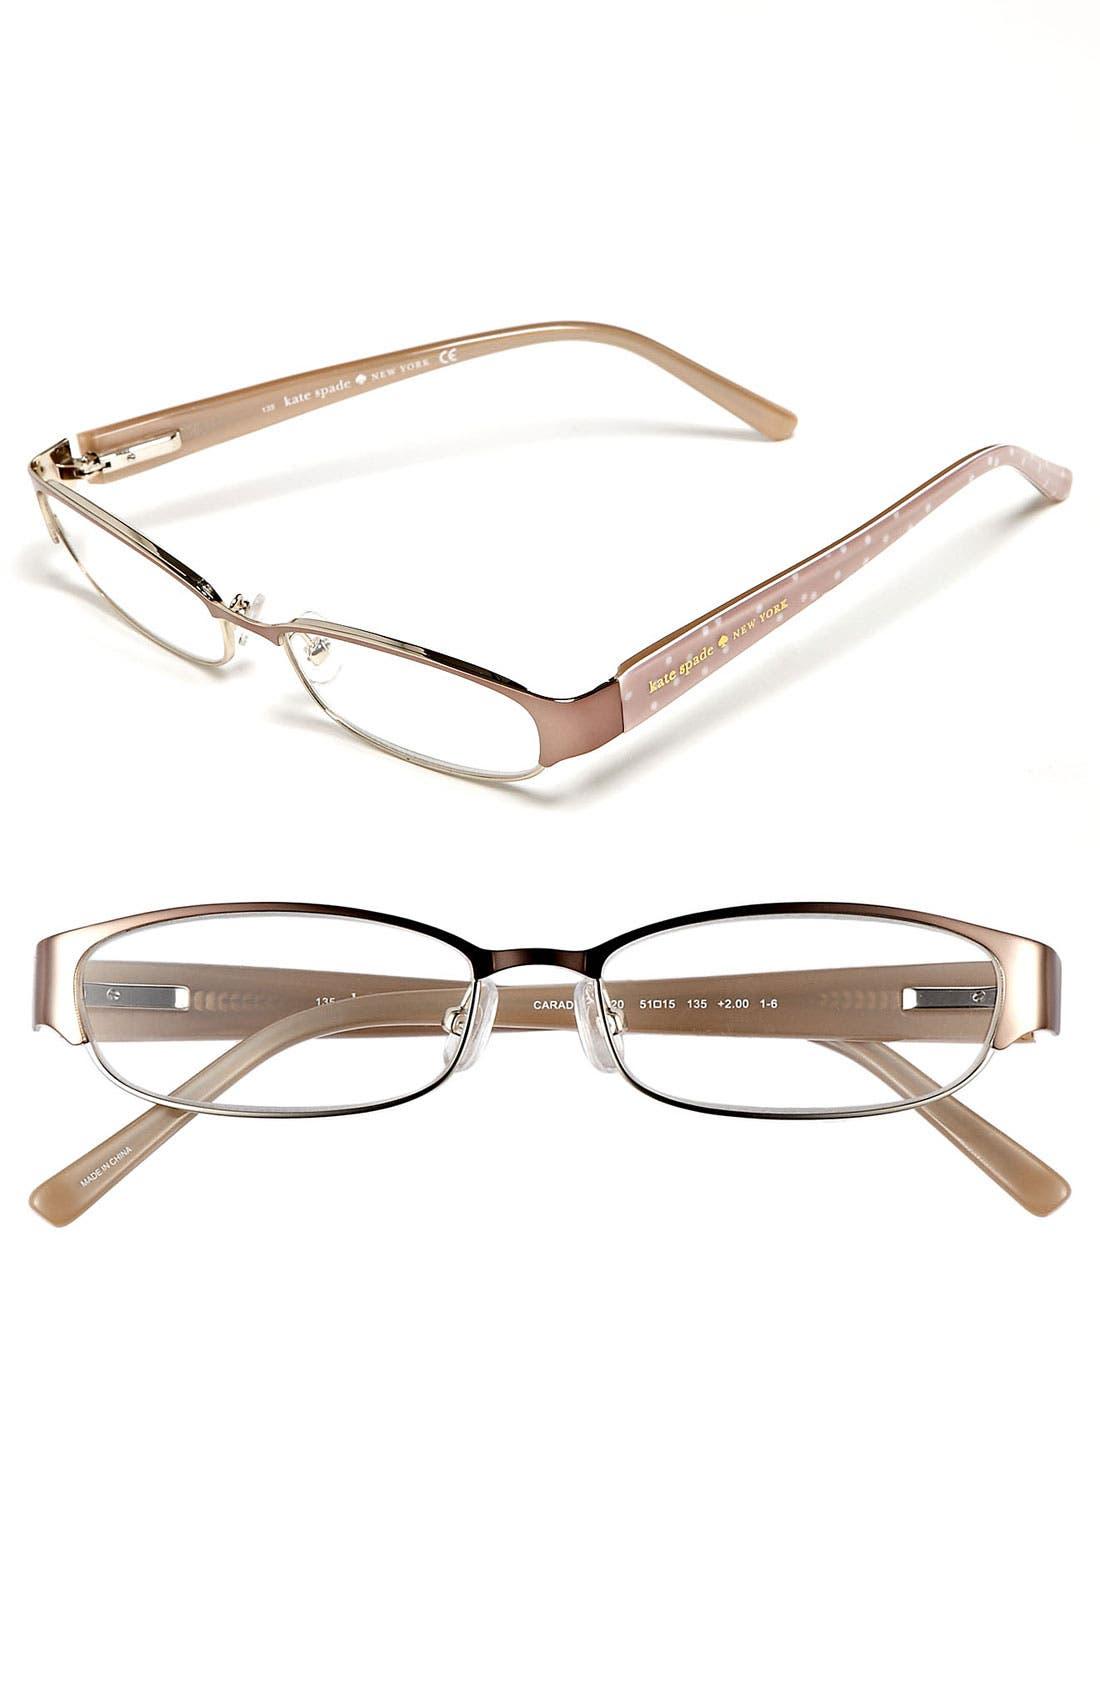 Main Image - kate spade new york 'caradee' reading glasses